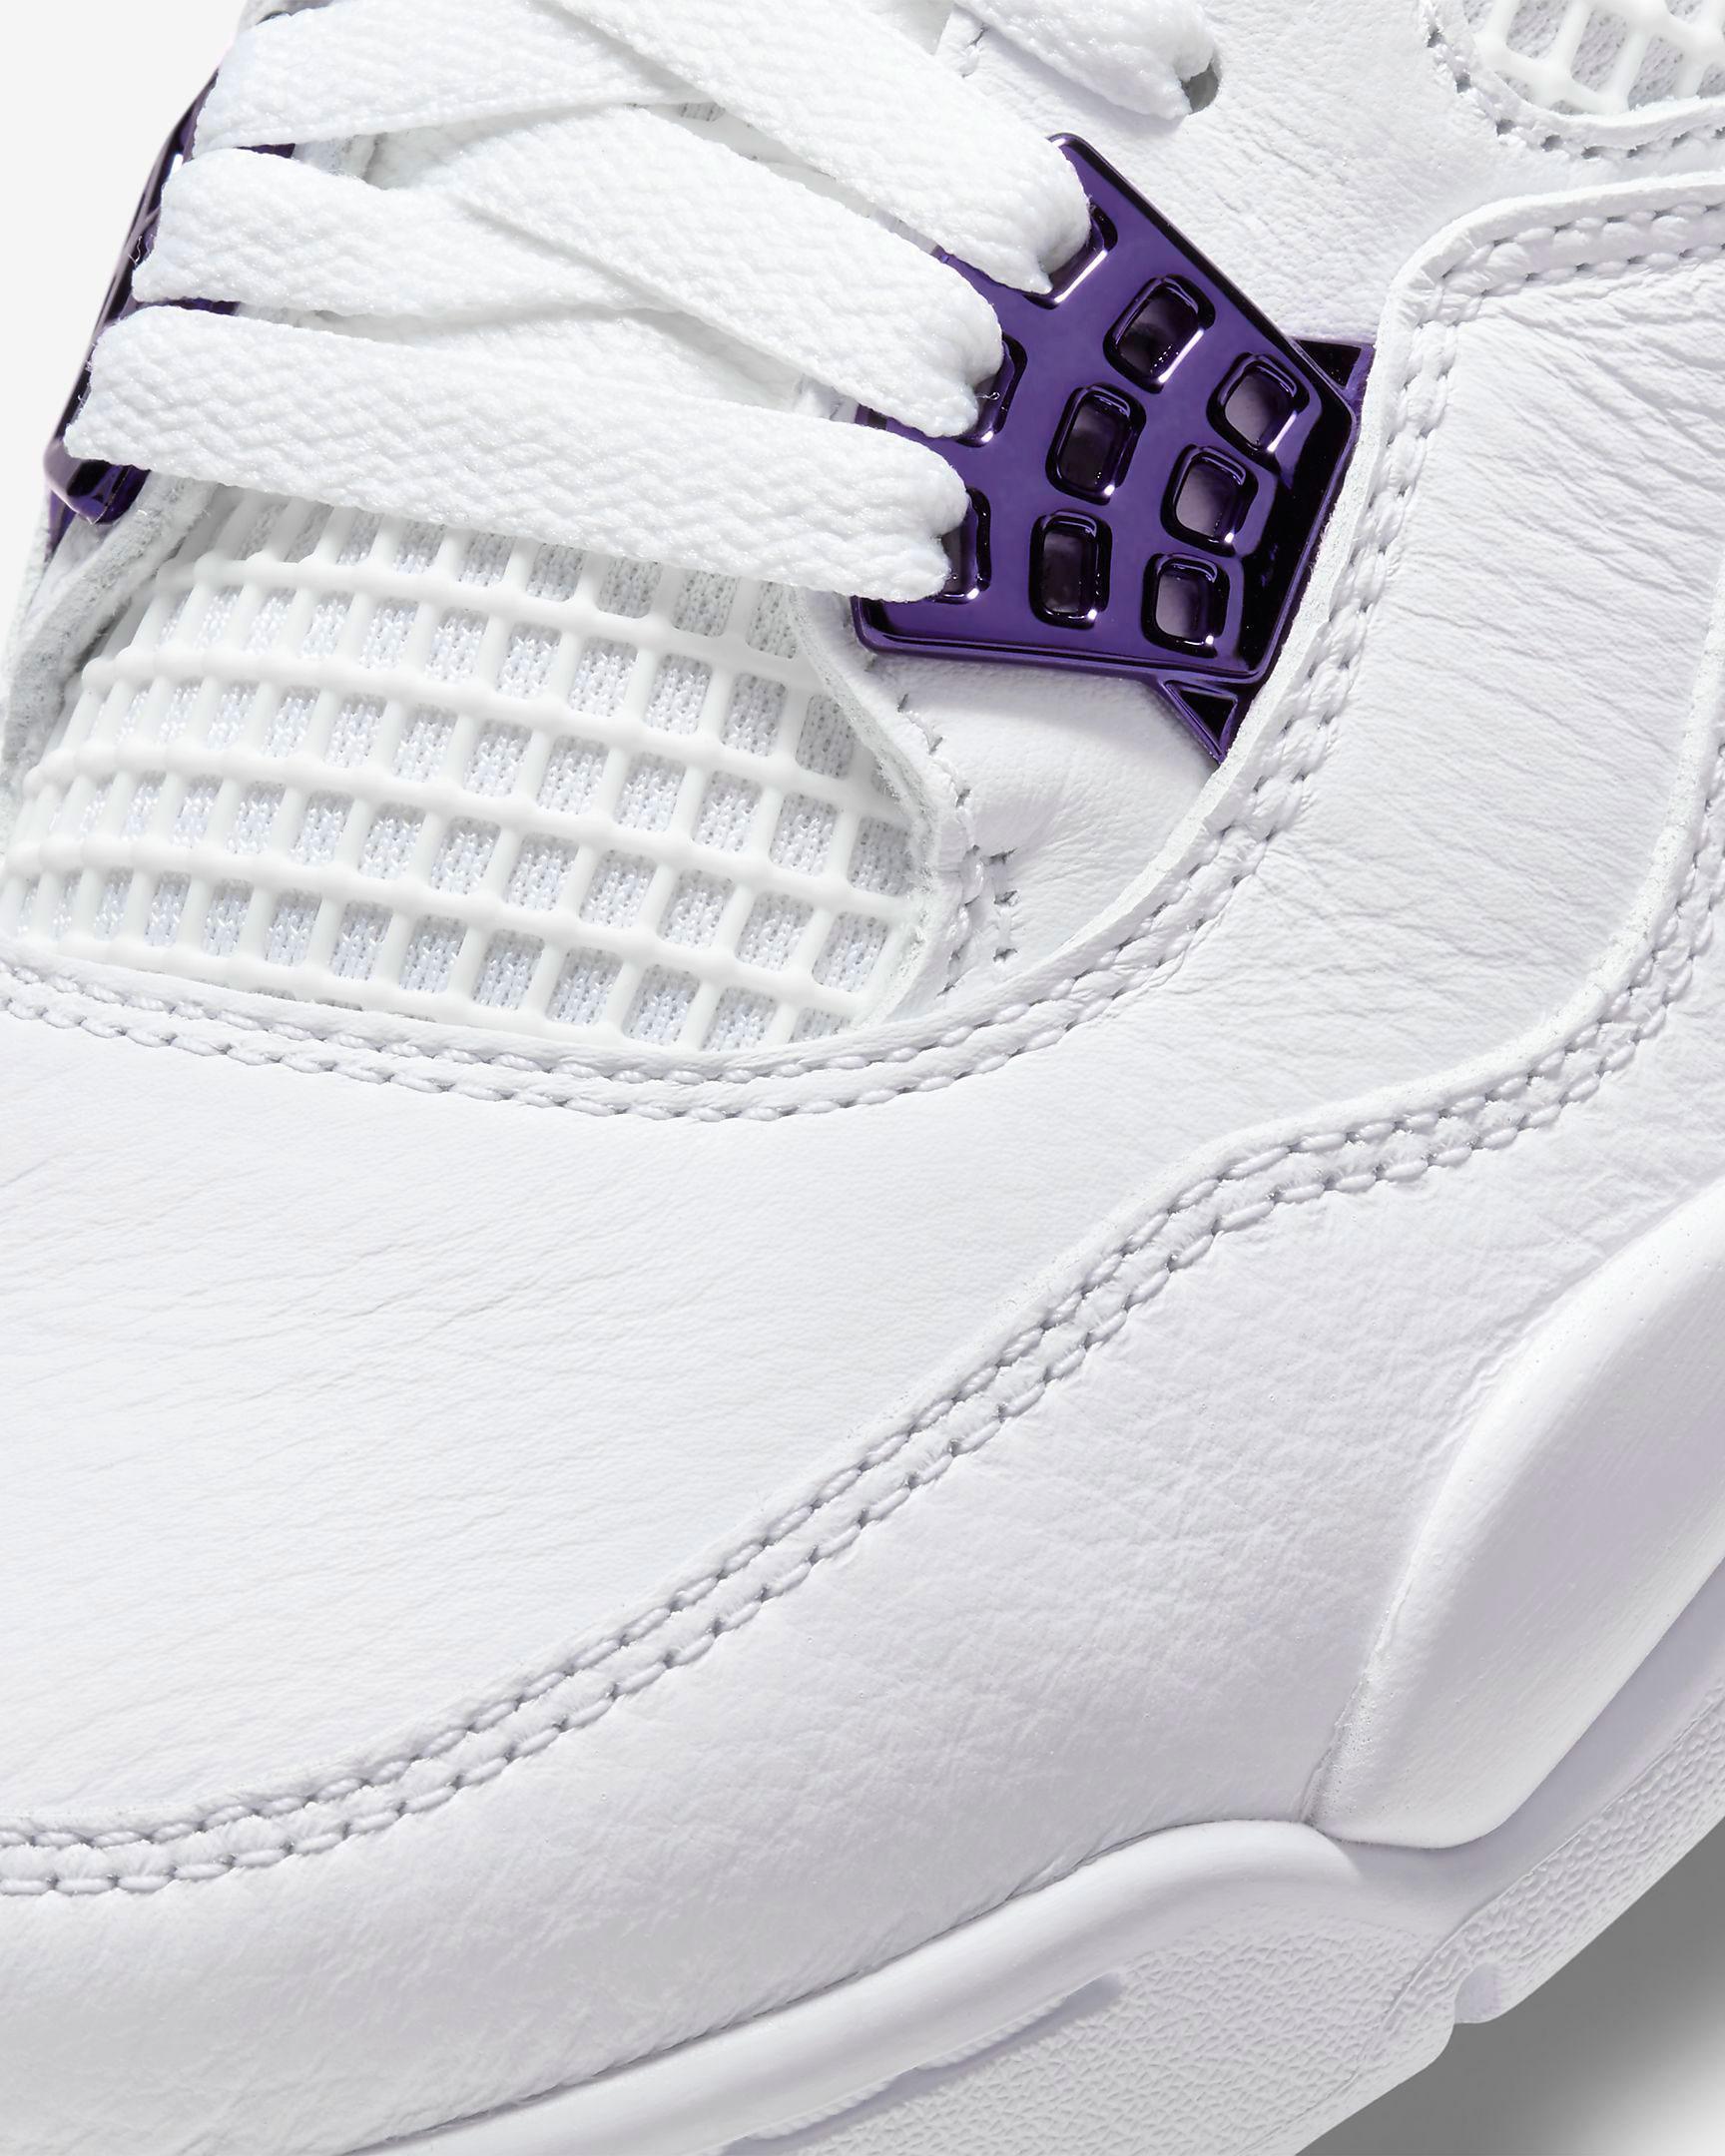 air-jordan-4-purple-metallic-release-date-price-4